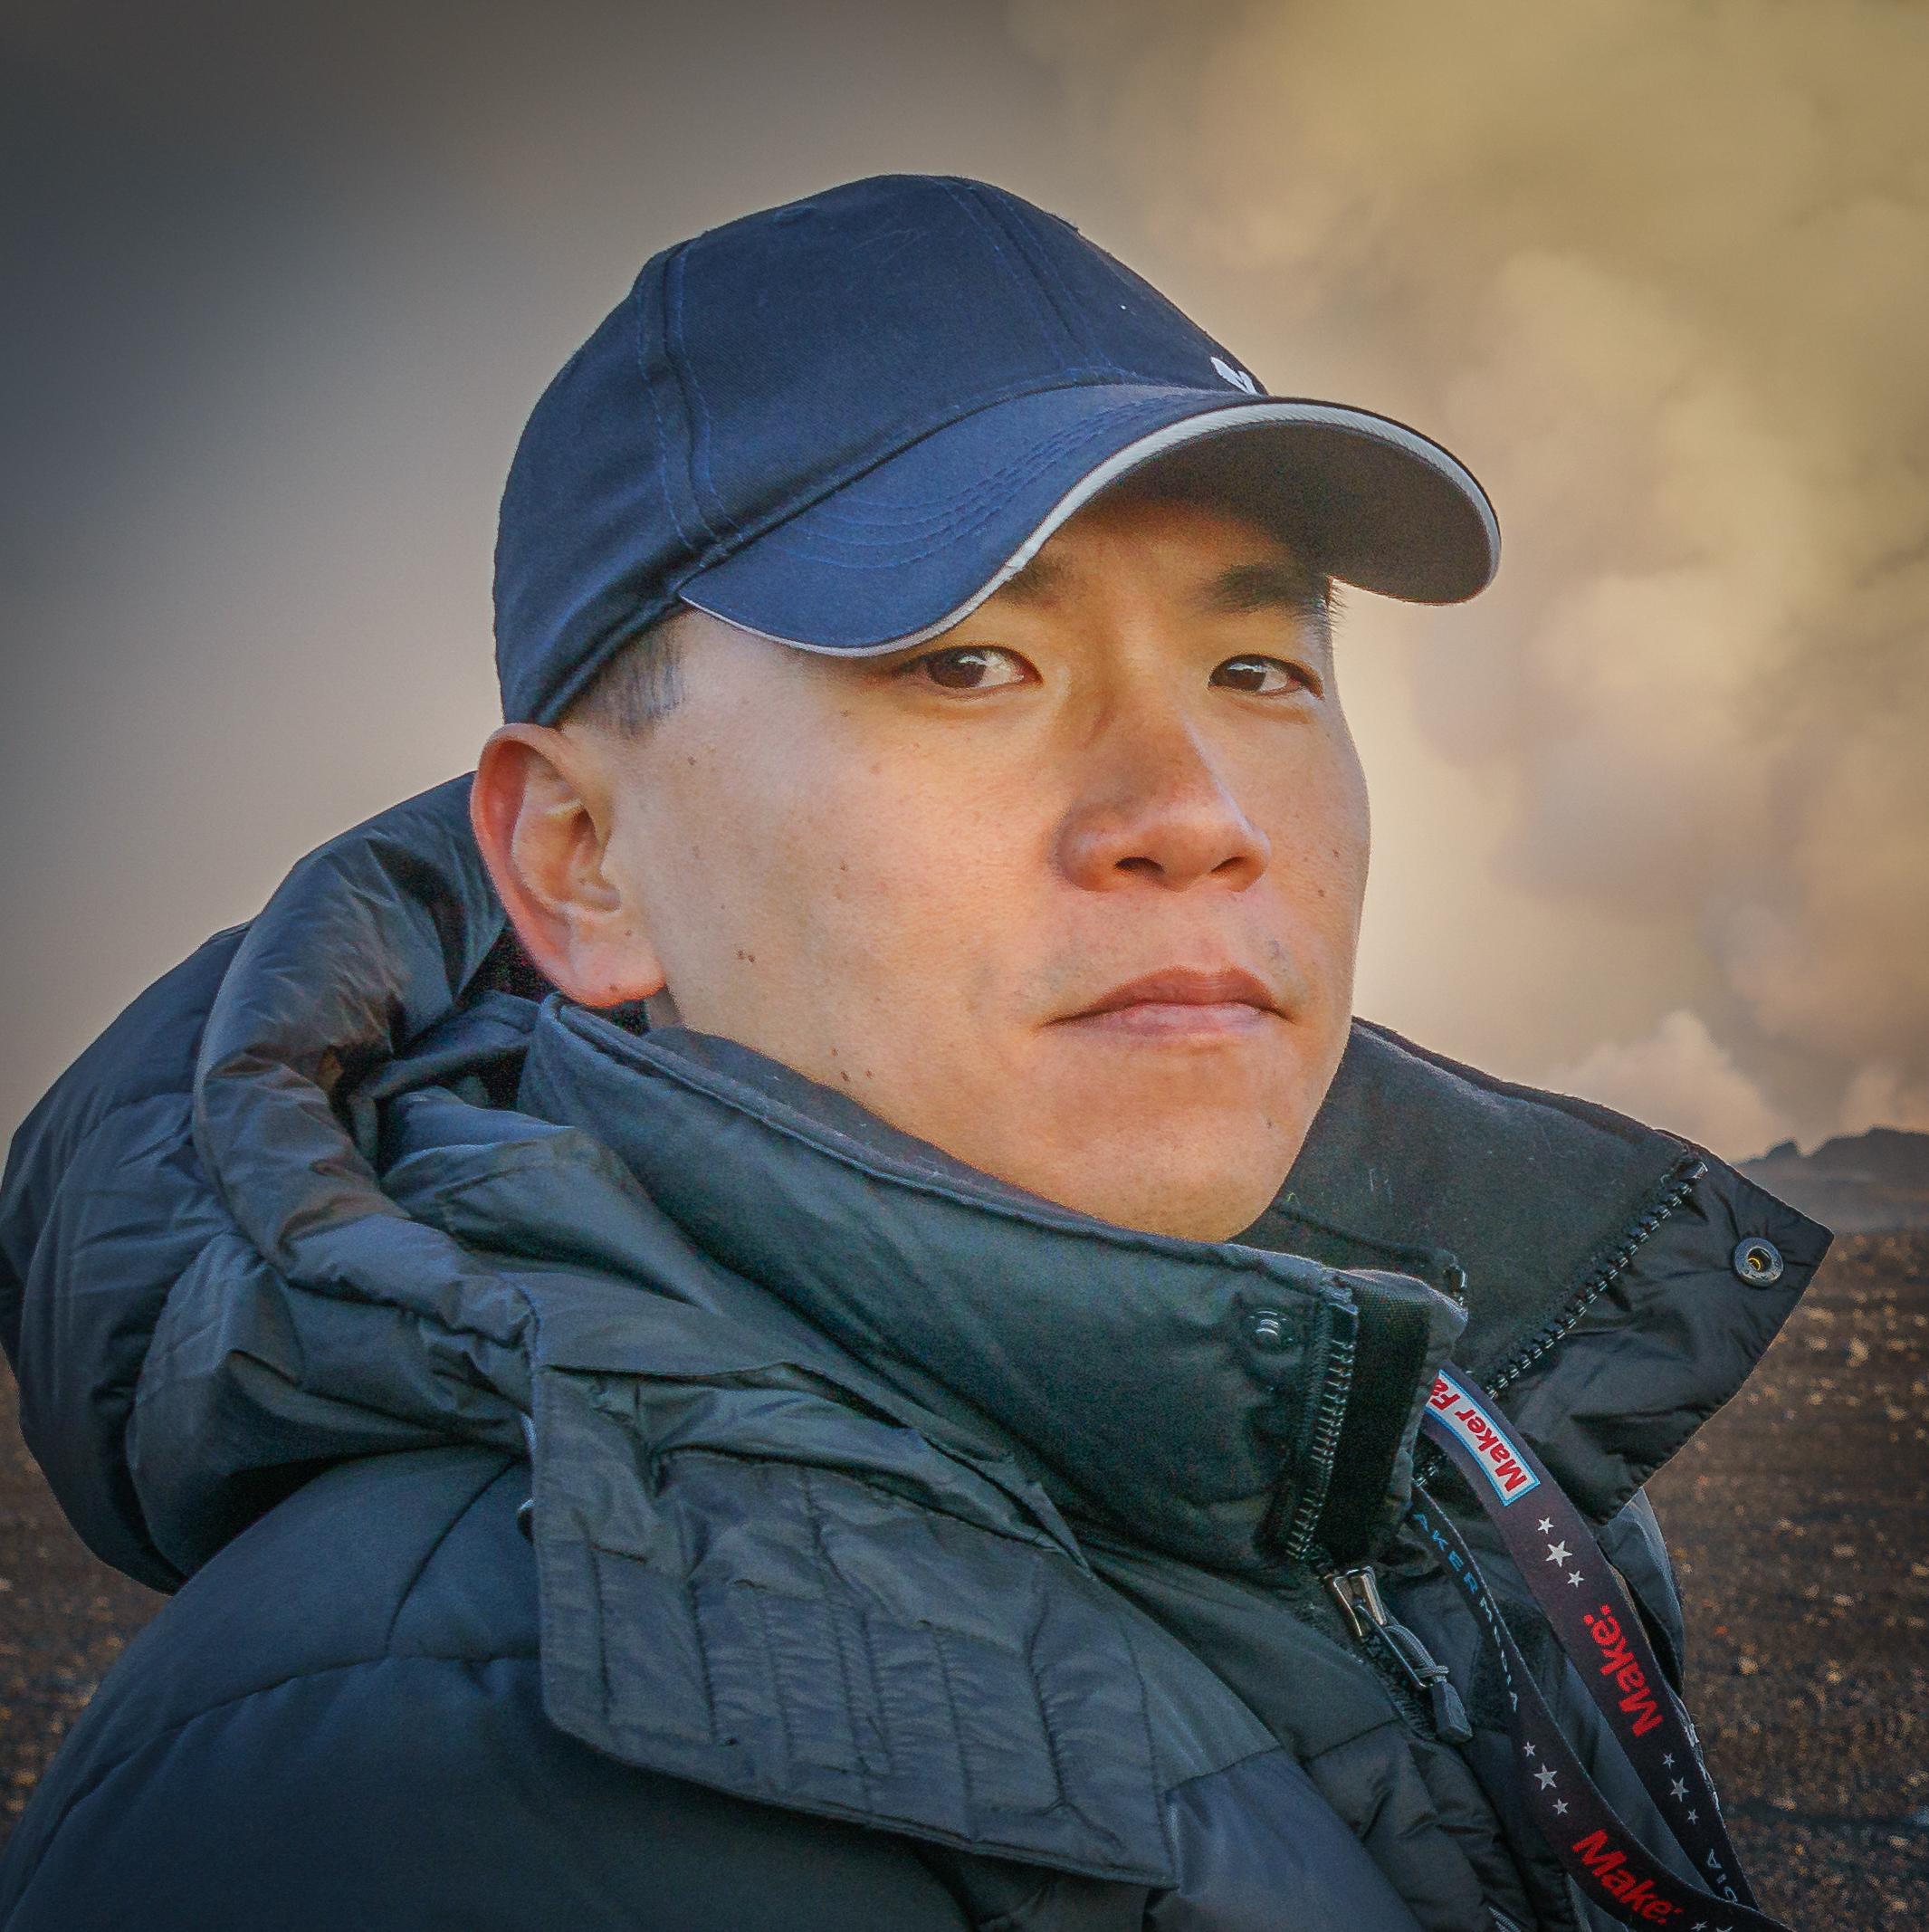 "<a href=""https://www.linkedin.com/in/ericcheng"" target=""_blank""><i>Eric Cheng</i></a><br><font size=""-1"">Director of Aerial Imaging</font><br><b>DJI</b>"